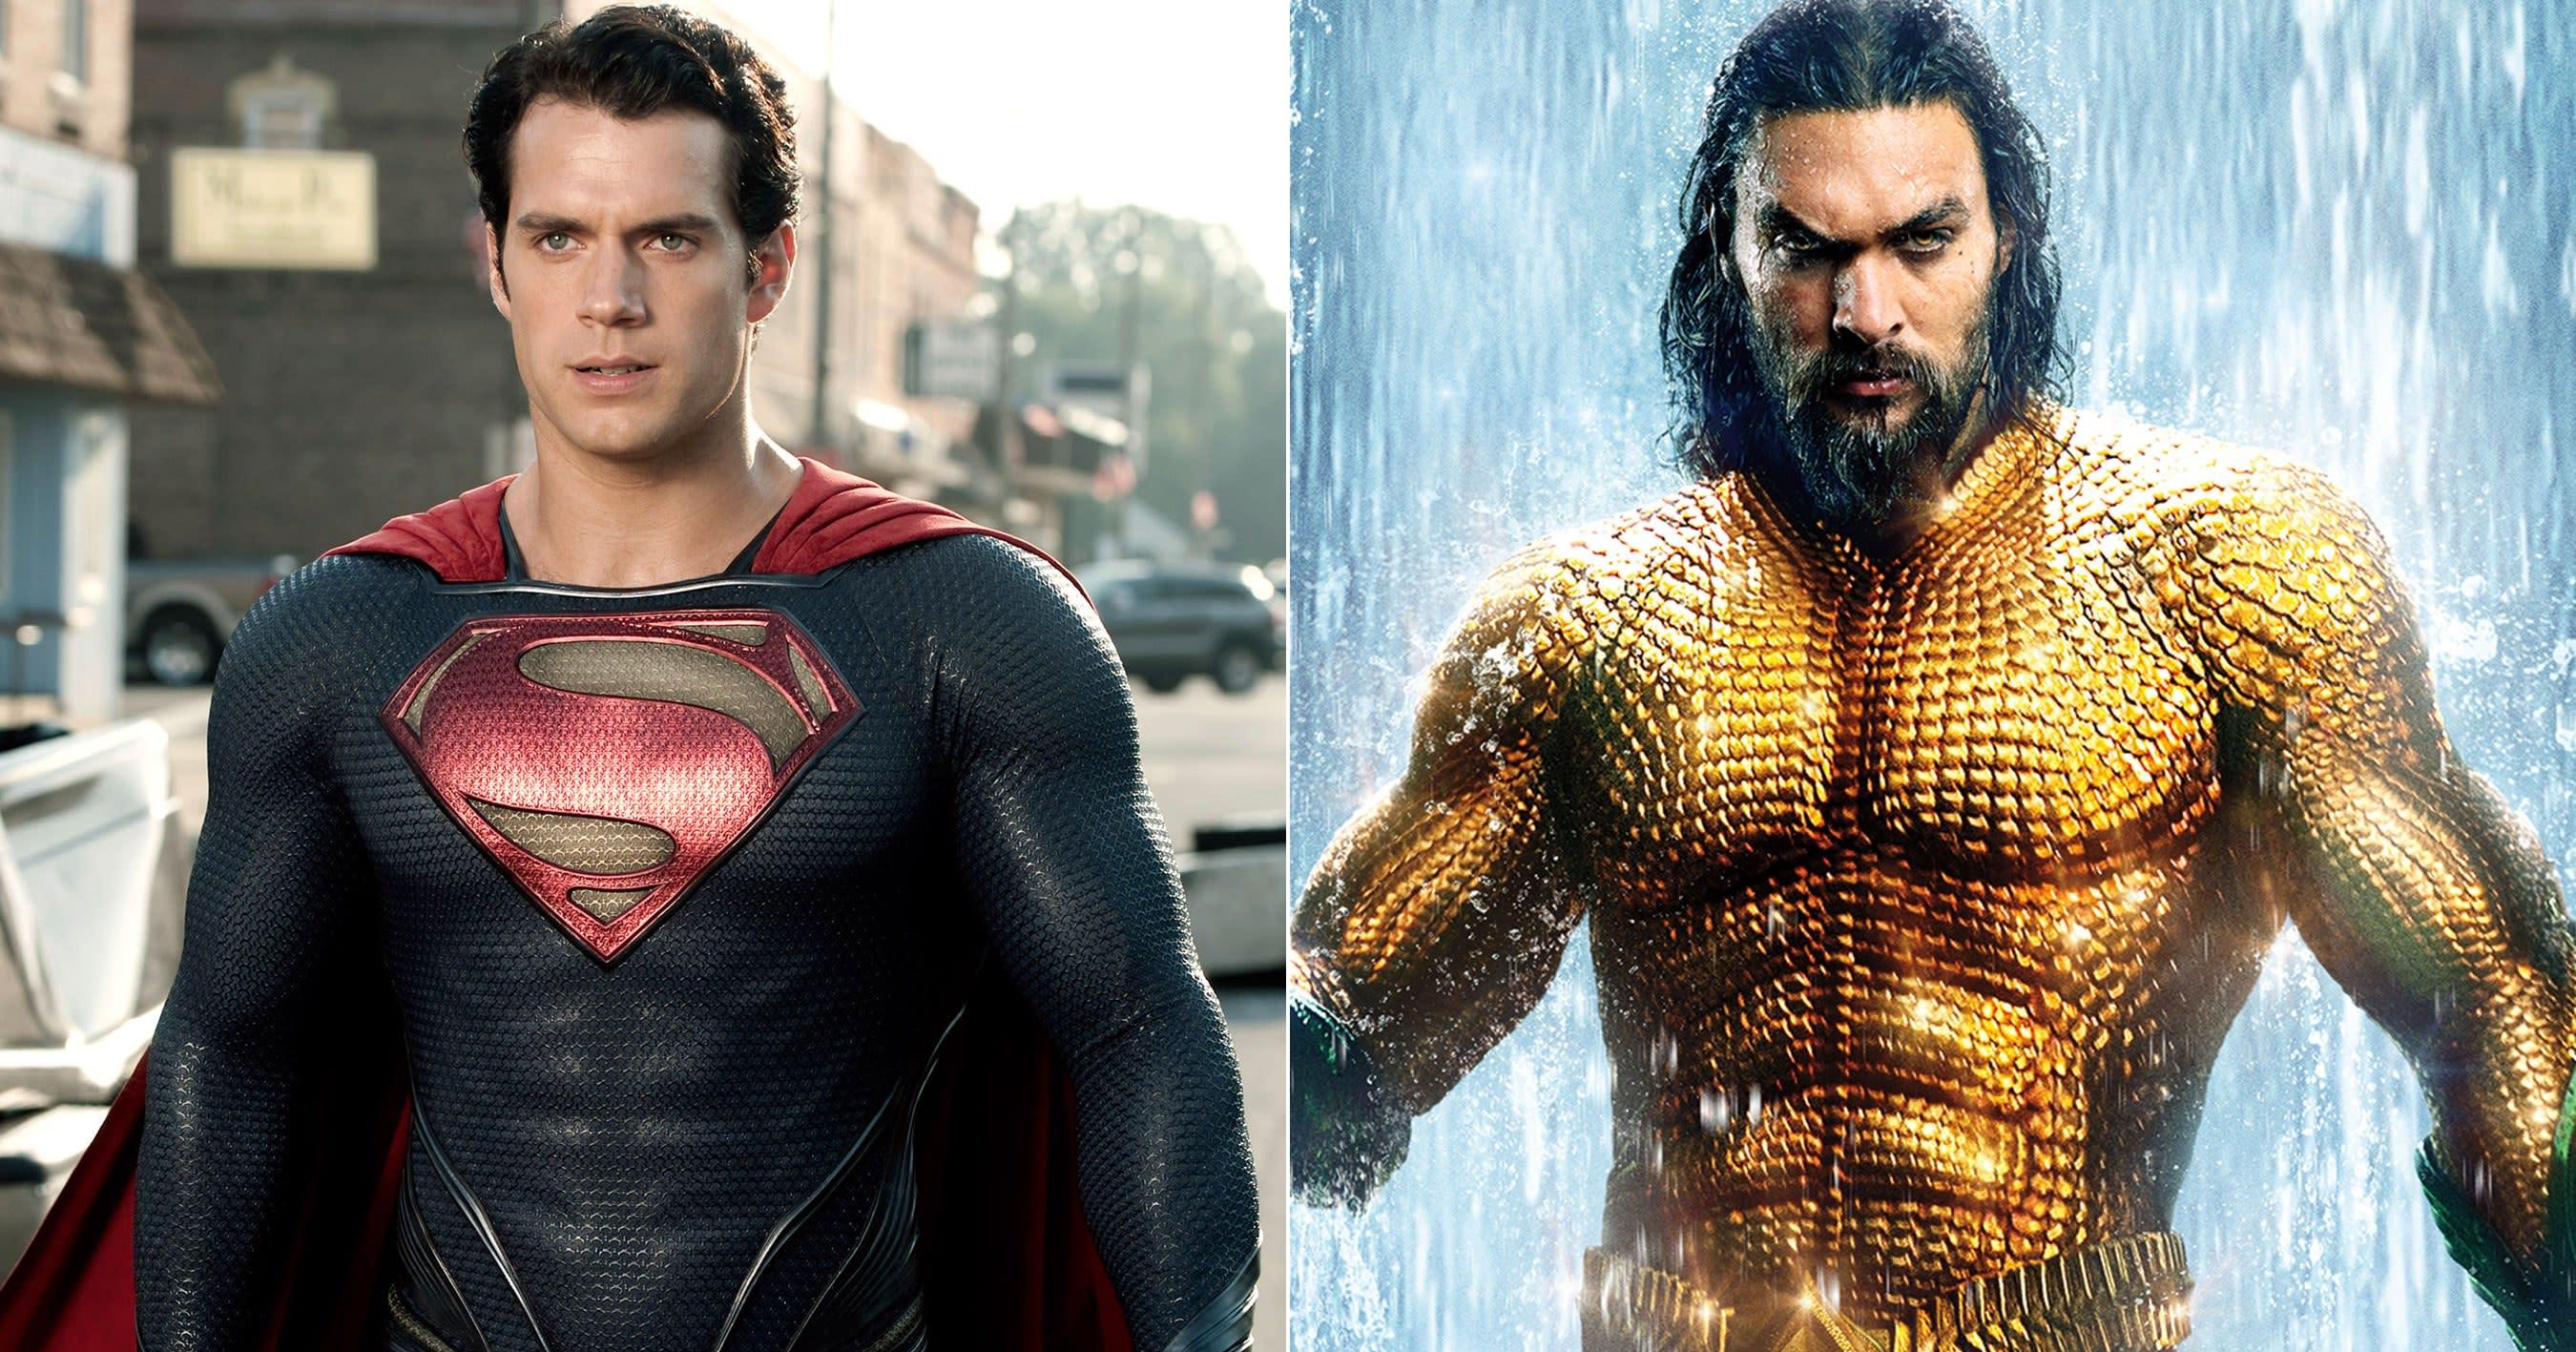 Henry Cavill Posts A Shirtless Jason Momoa Impression To Praise Aquaman